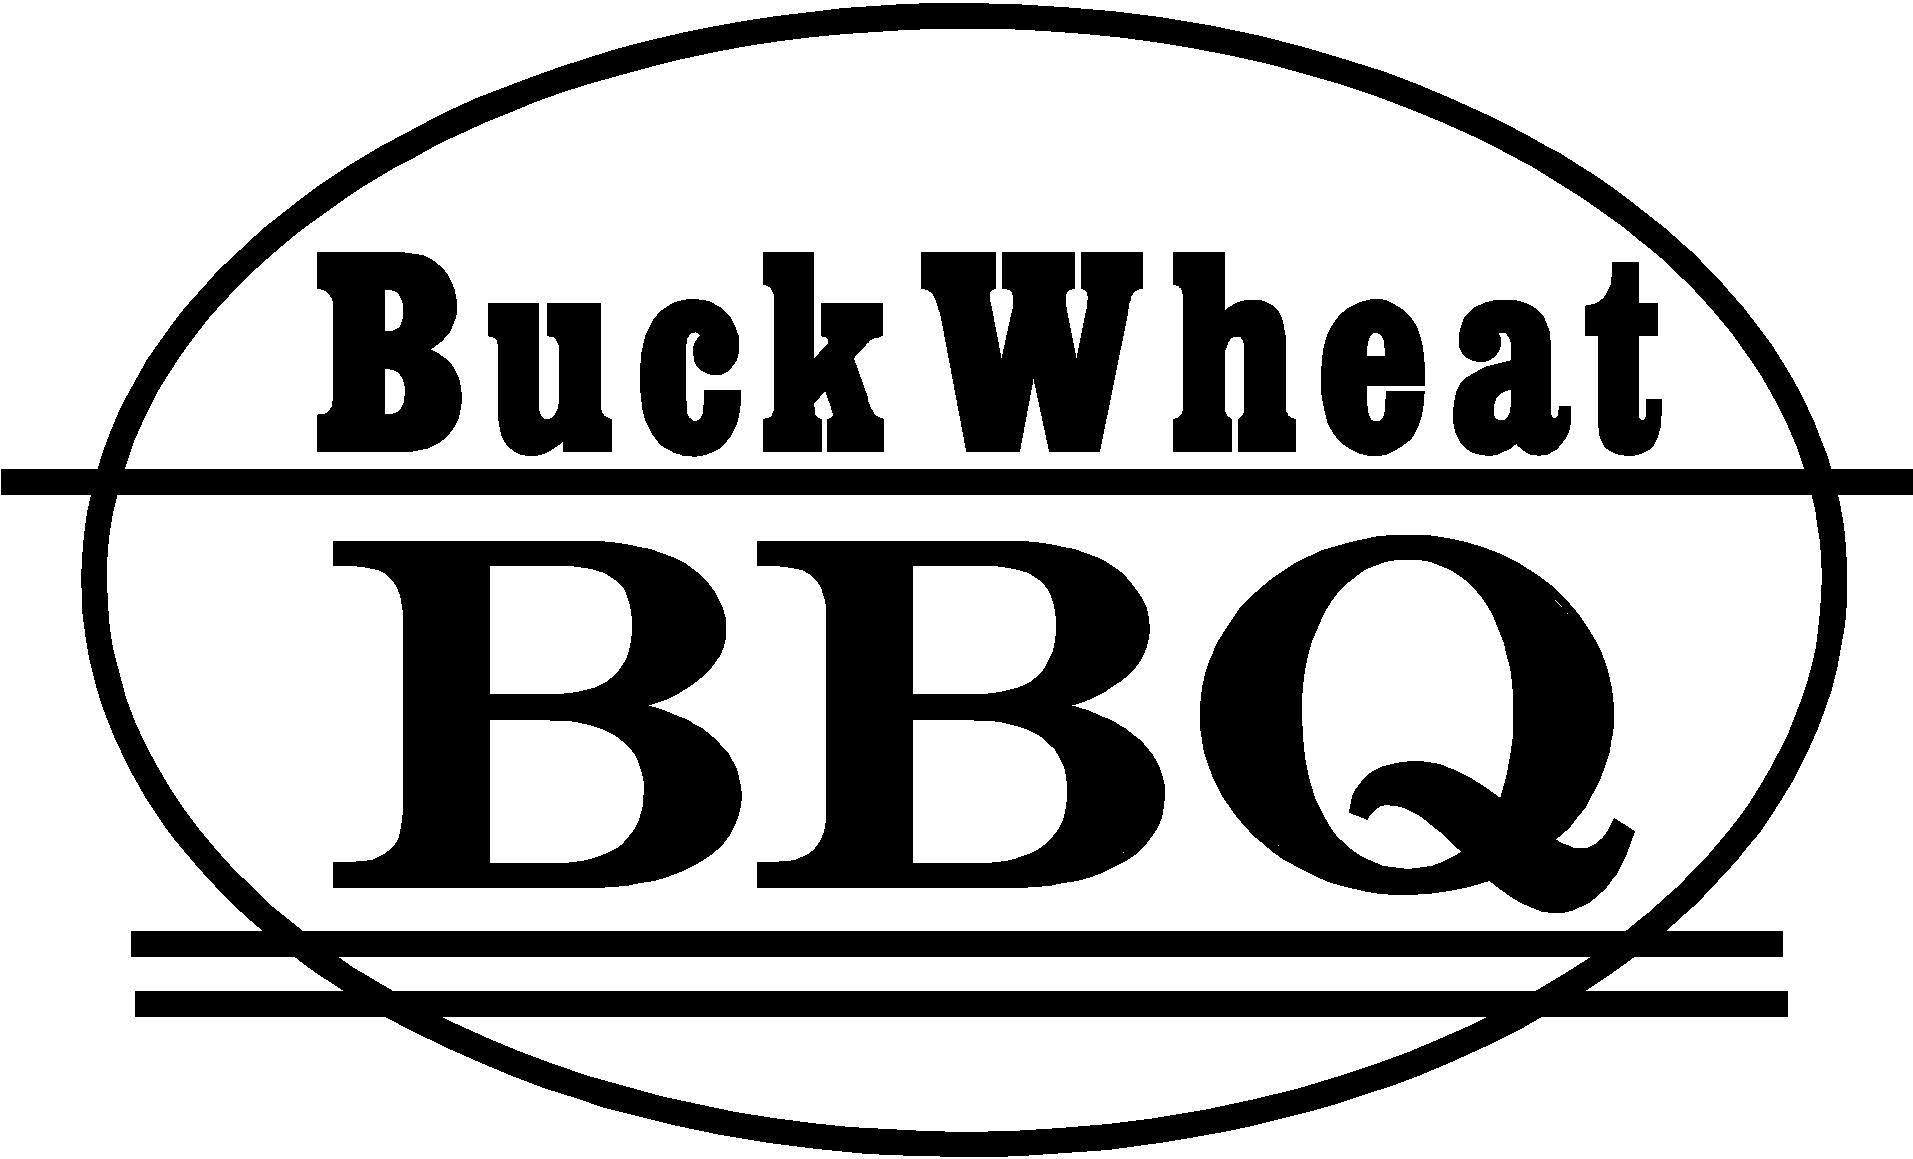 Buckwheat BBQ